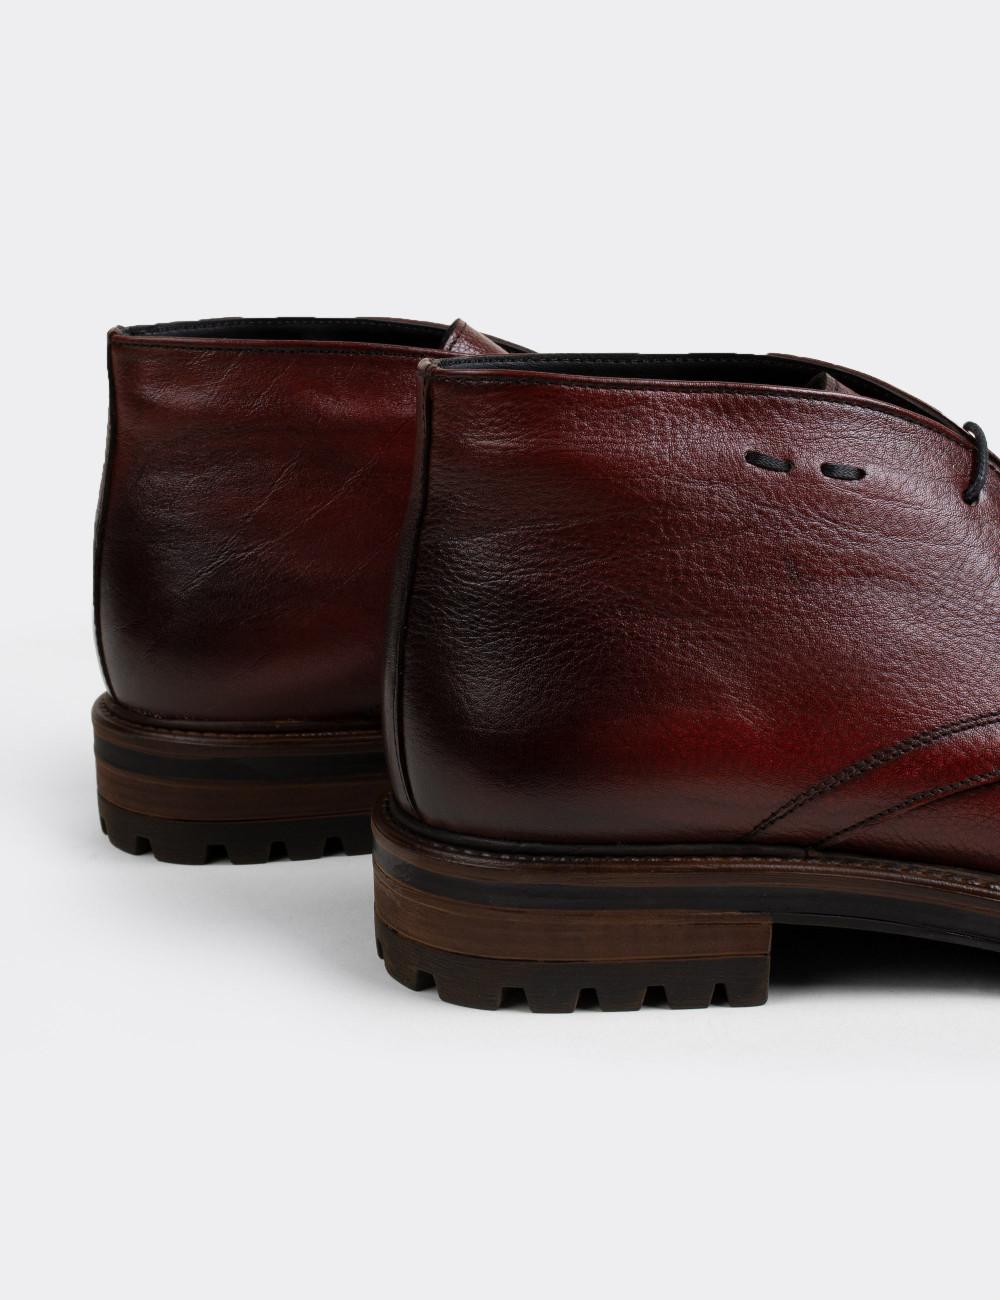 Hakiki Deri Bordo Vintage Erkek Çöl Bot - 01295MBRDC01